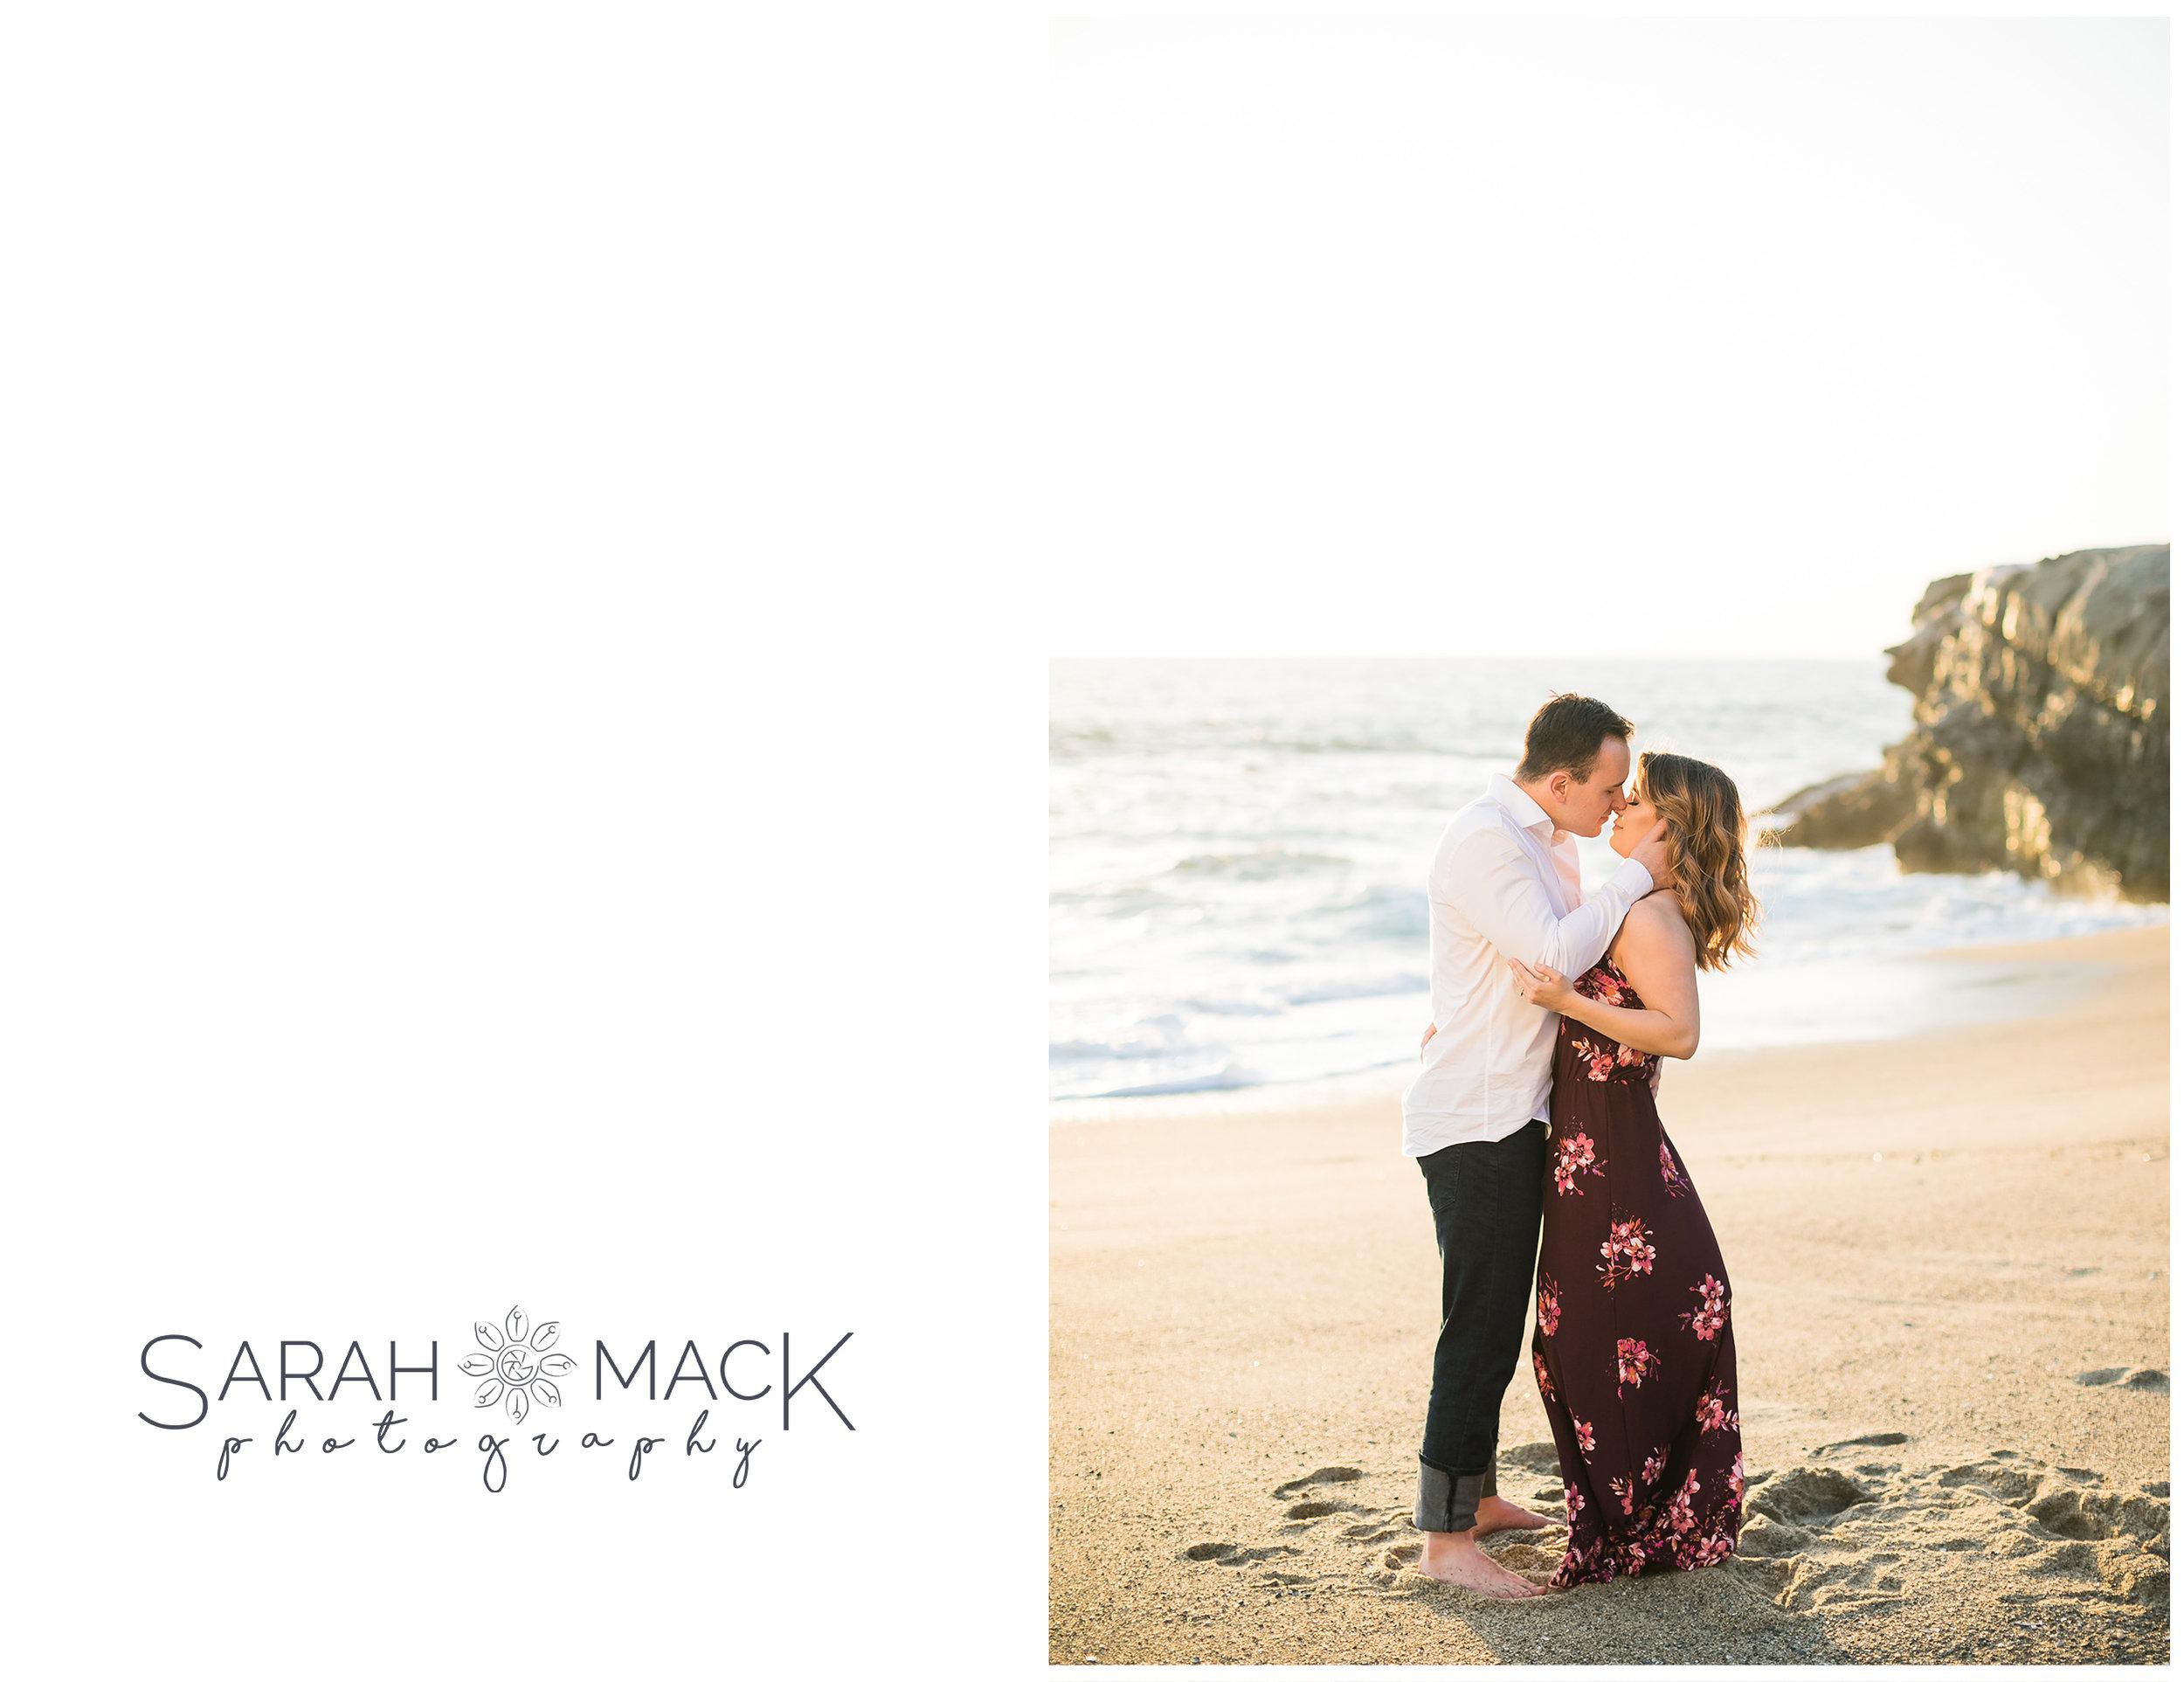 LN-Table-Rock-Beach-Laguna-Engagement-Photography-12.jpg